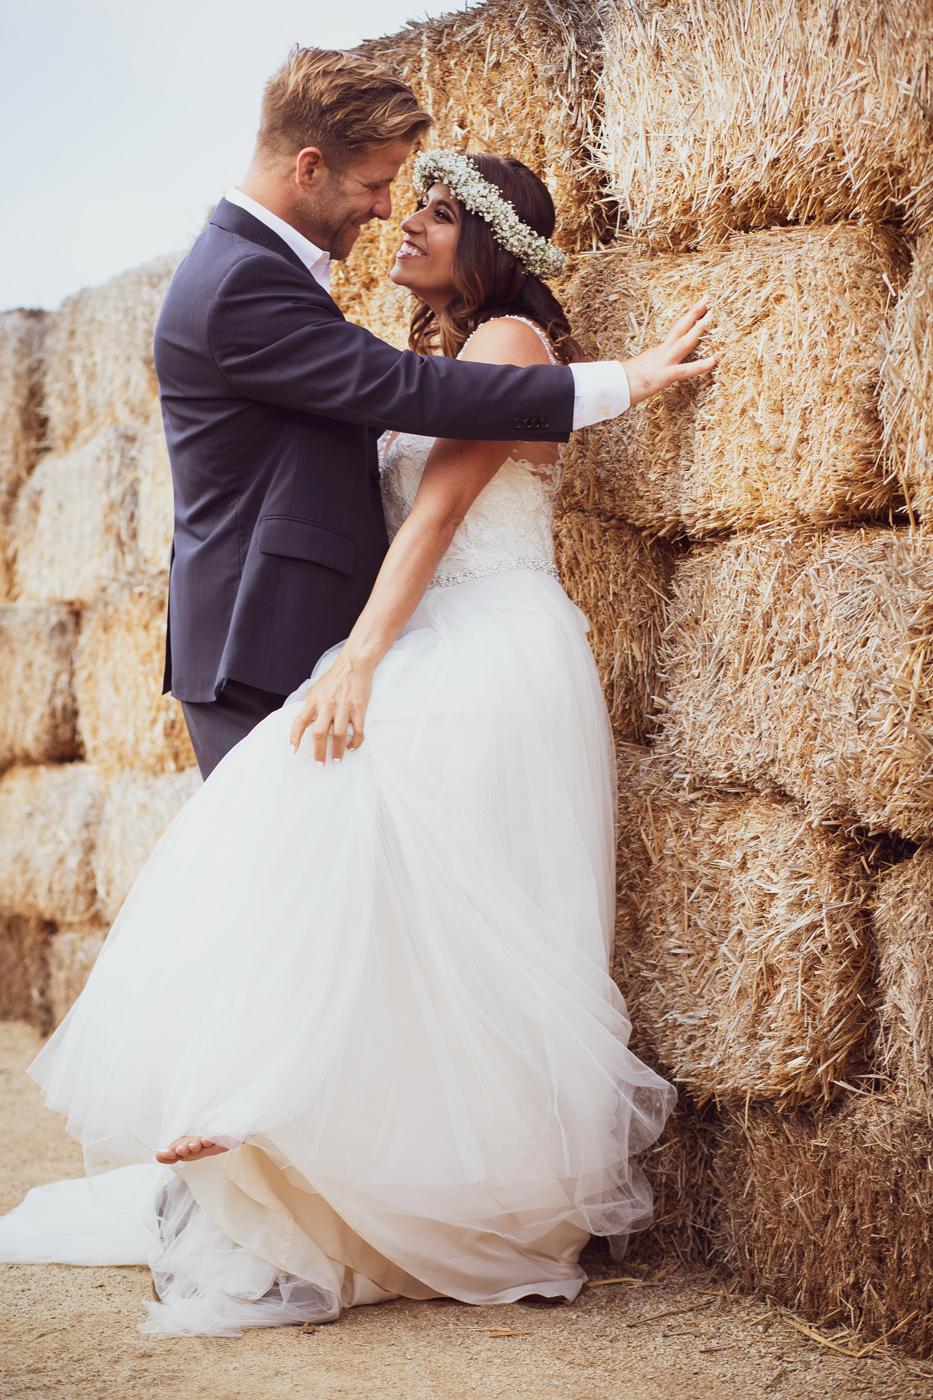 MelissaMontoyaPhotography_Weddings_2018_June_CuatroCuatros_5670-Edit_WEB